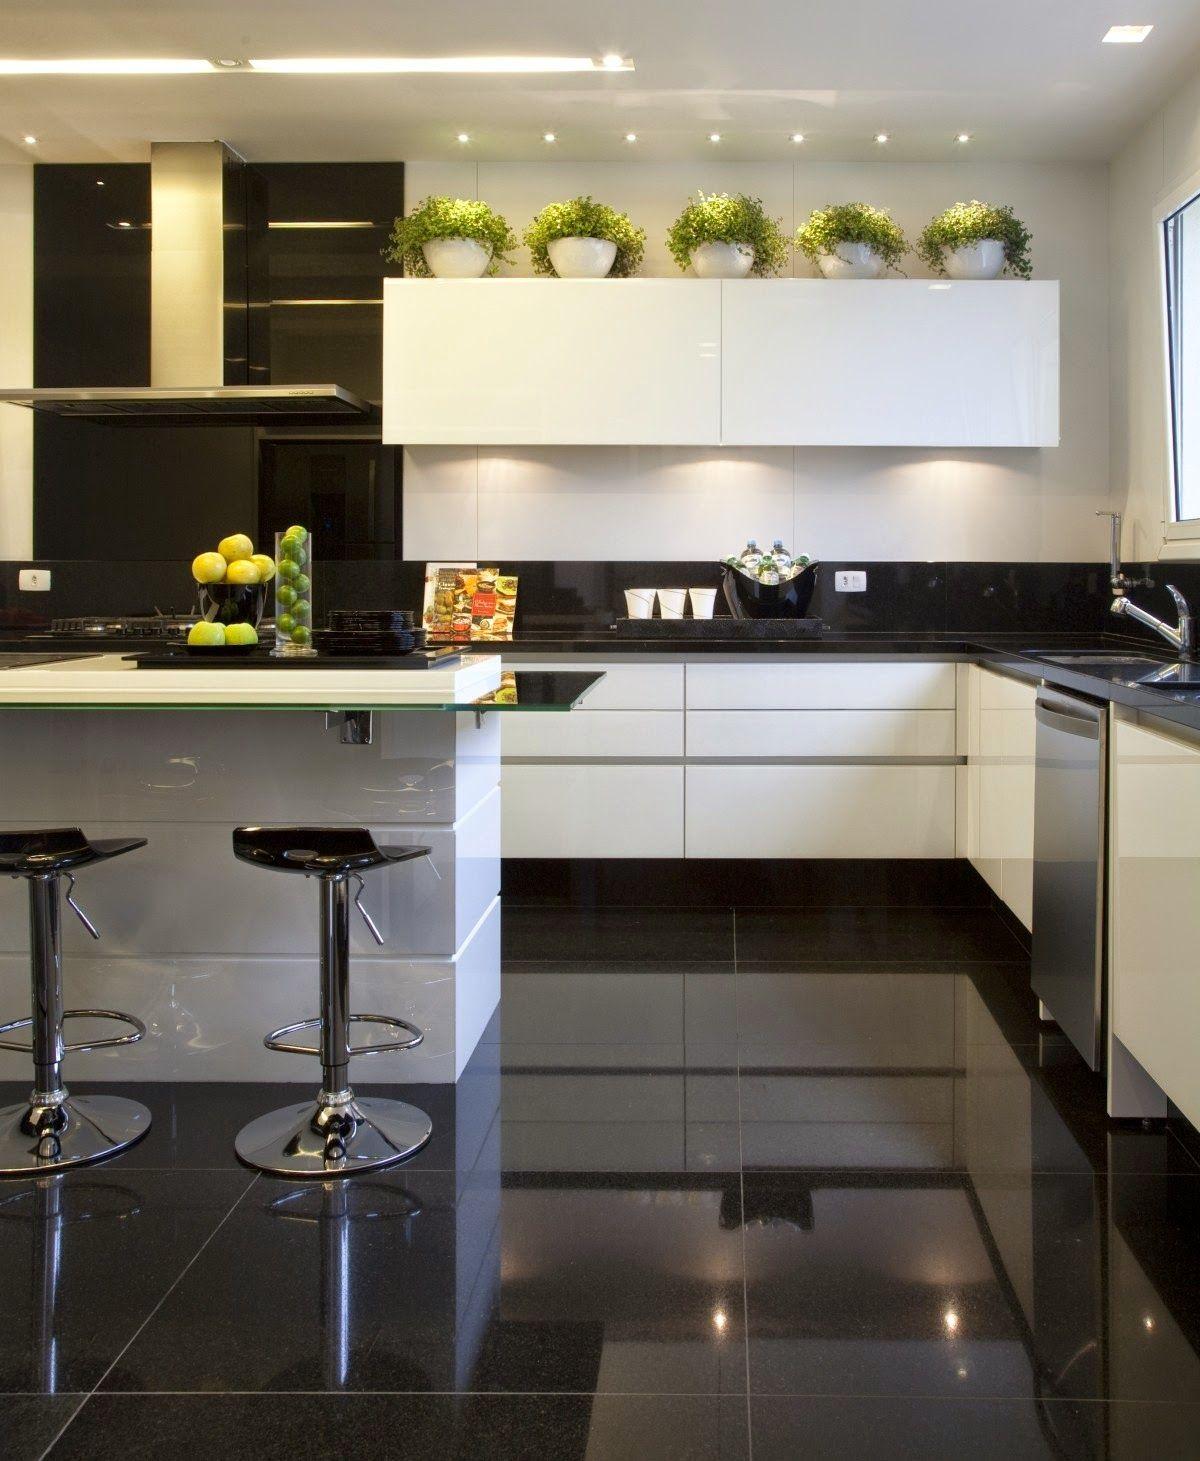 6 fuß kücheninsel ideen apartamento moderno com decoração preto u branco maravilhoso  căn